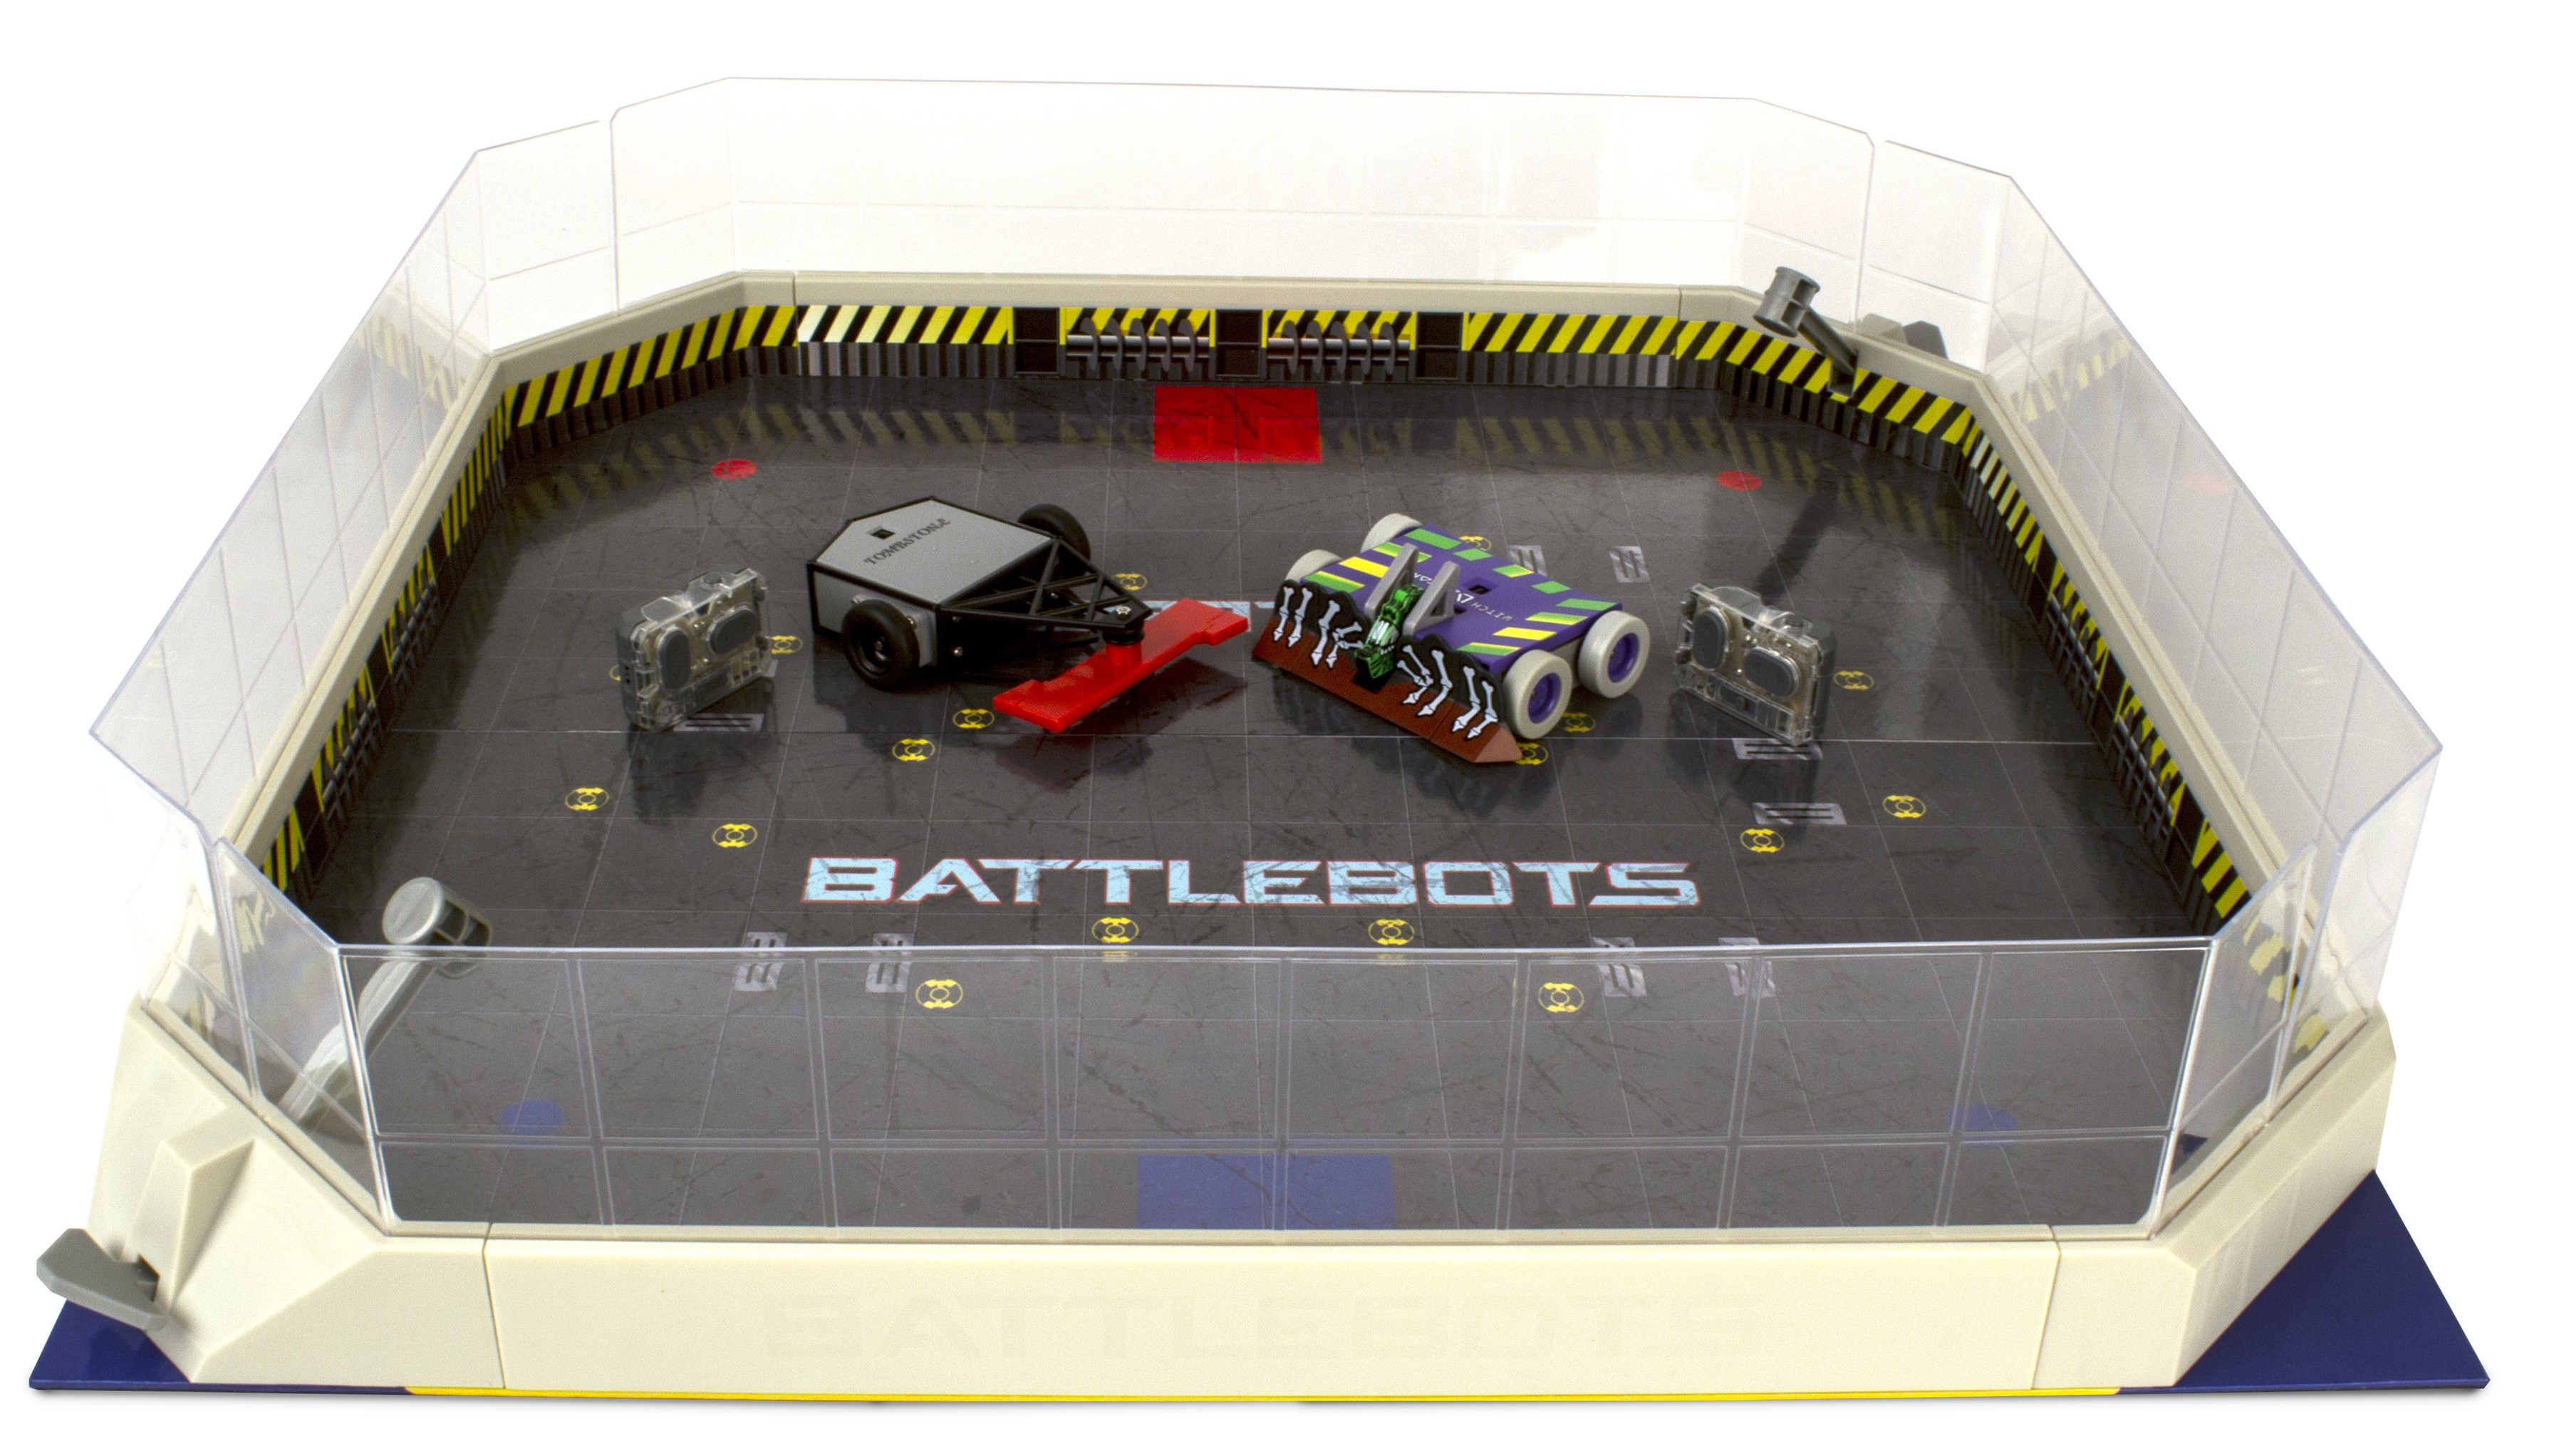 Battlebots Arena (Toy)